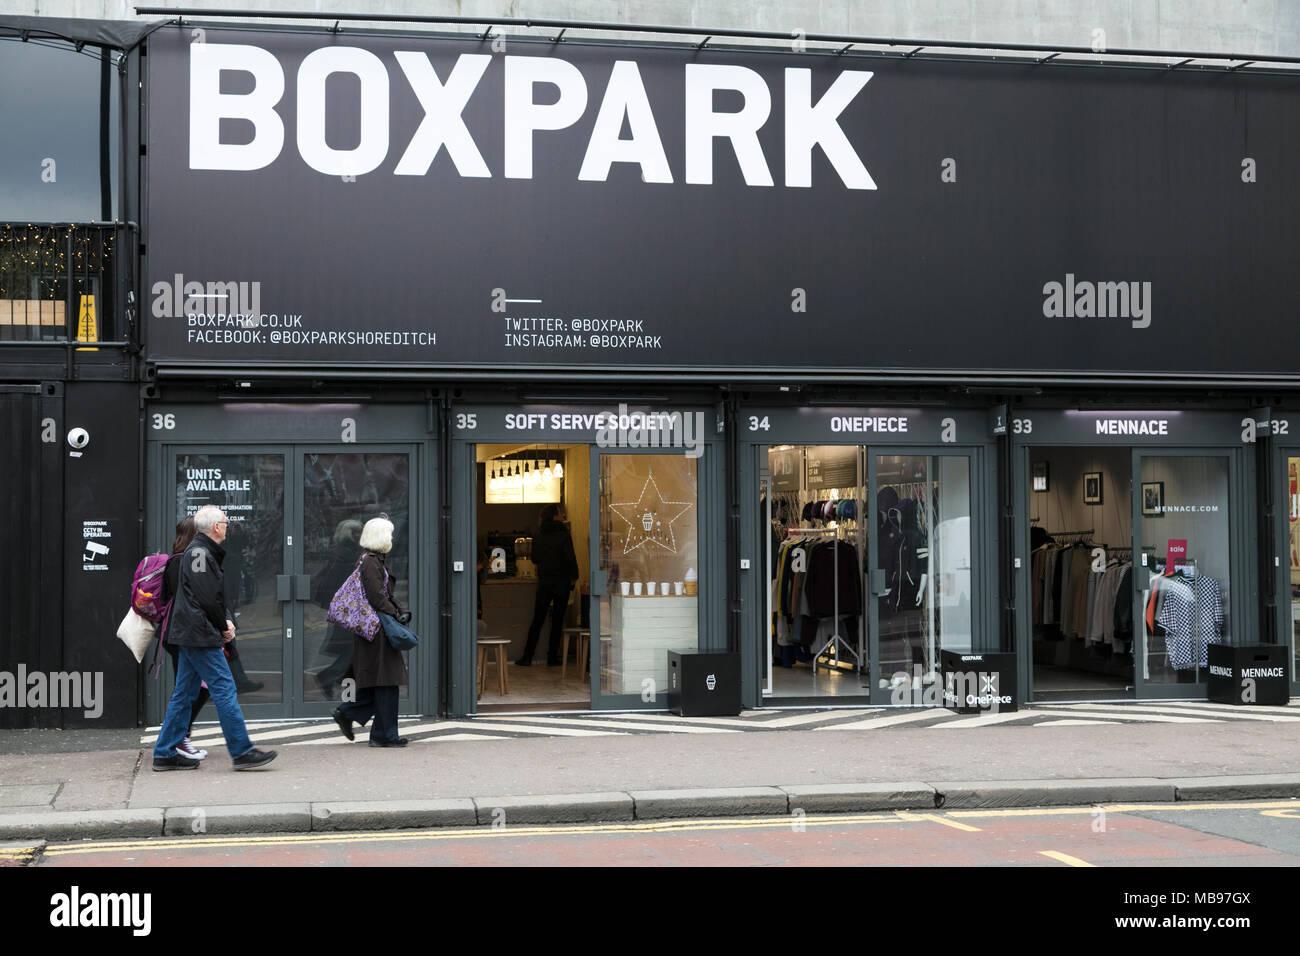 513c28cf241c9 Box Park, Bethnal Green Road, Shoreditch, London Stock Photo ...